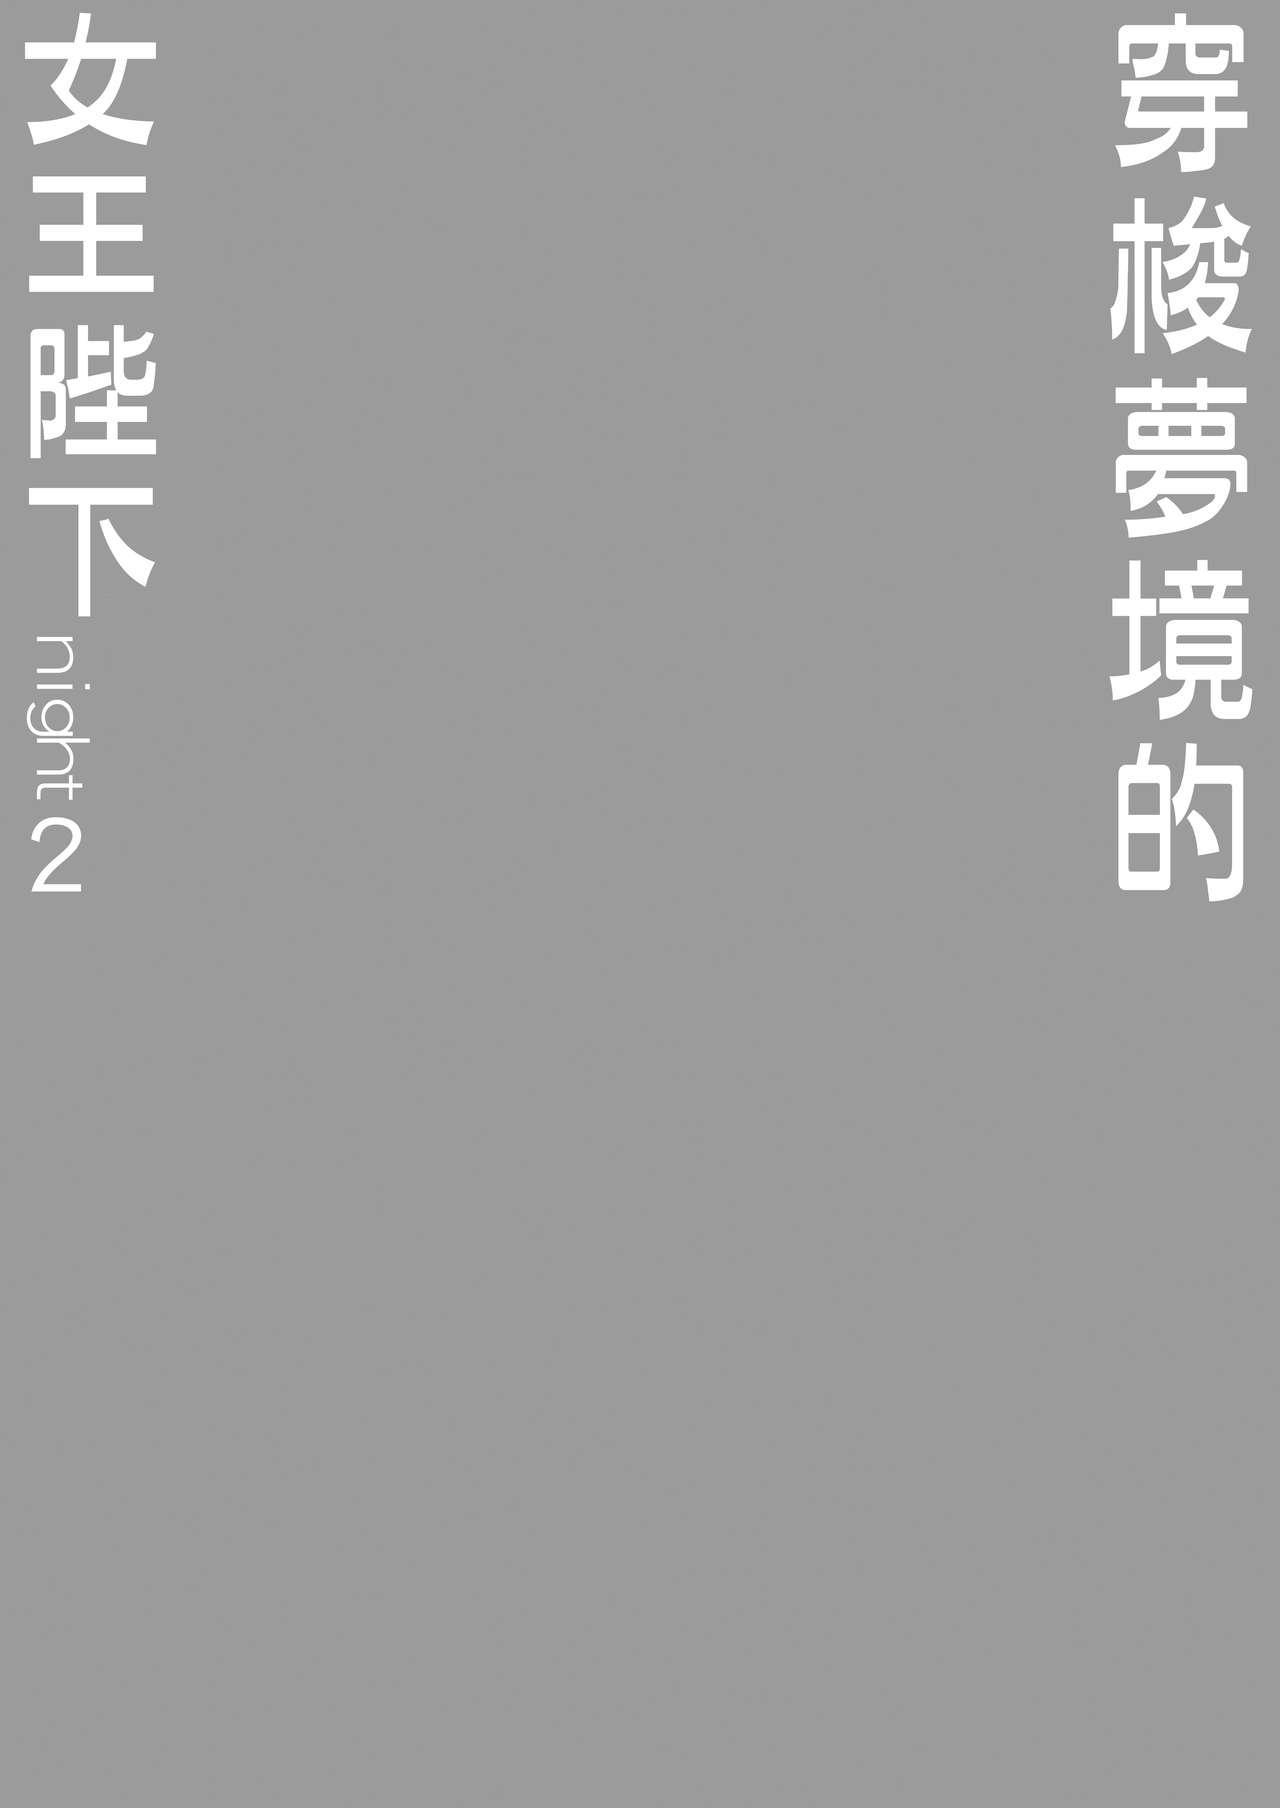 Yumewatari no Mistress Night 2 | 穿梭夢境的女王陛下 night 2 1